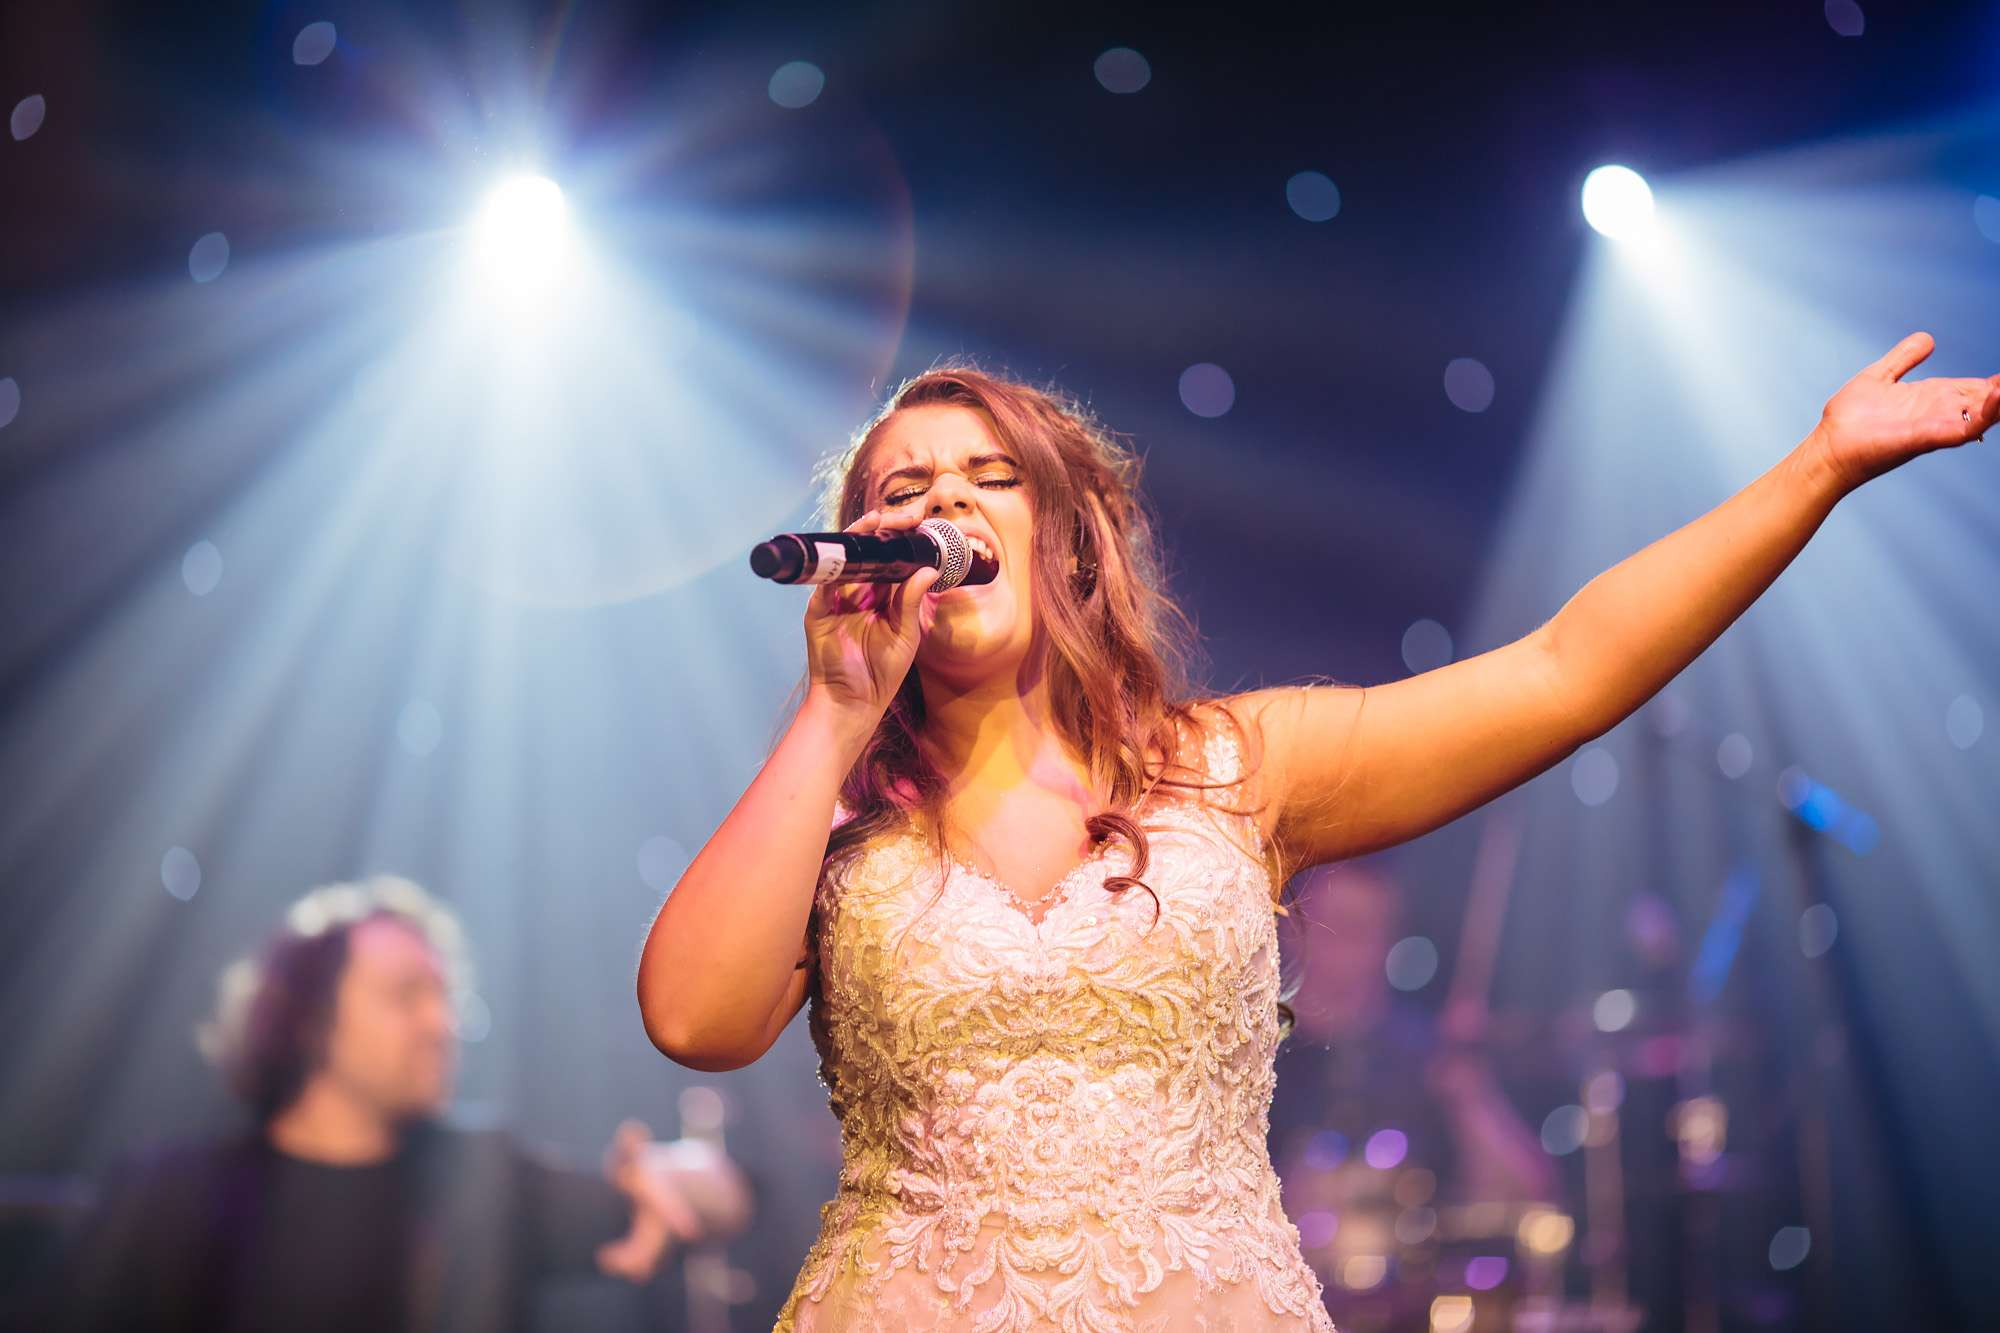 Bride singing at her own wedding